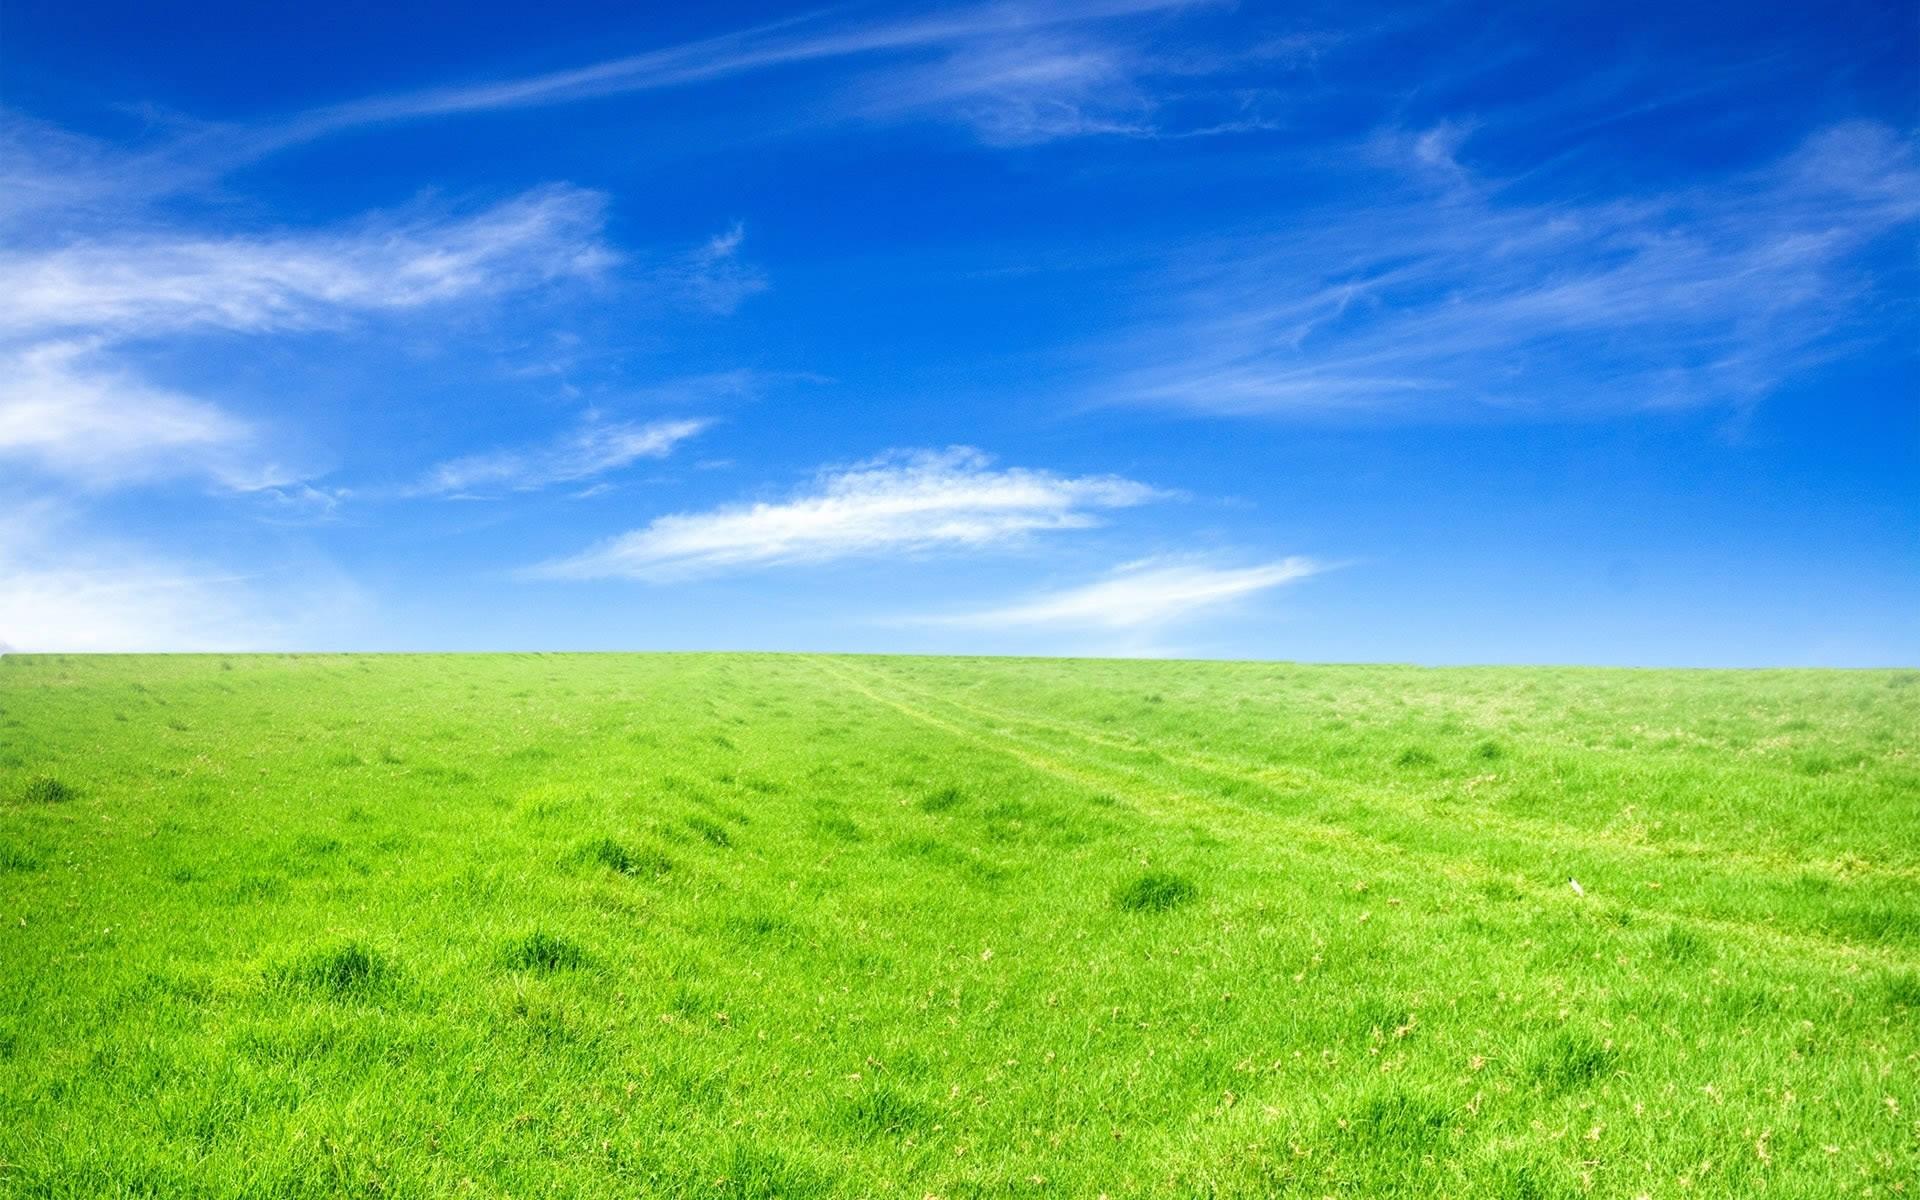 Wallpaper : sunlight, landscape, hill, sky, field, horizon